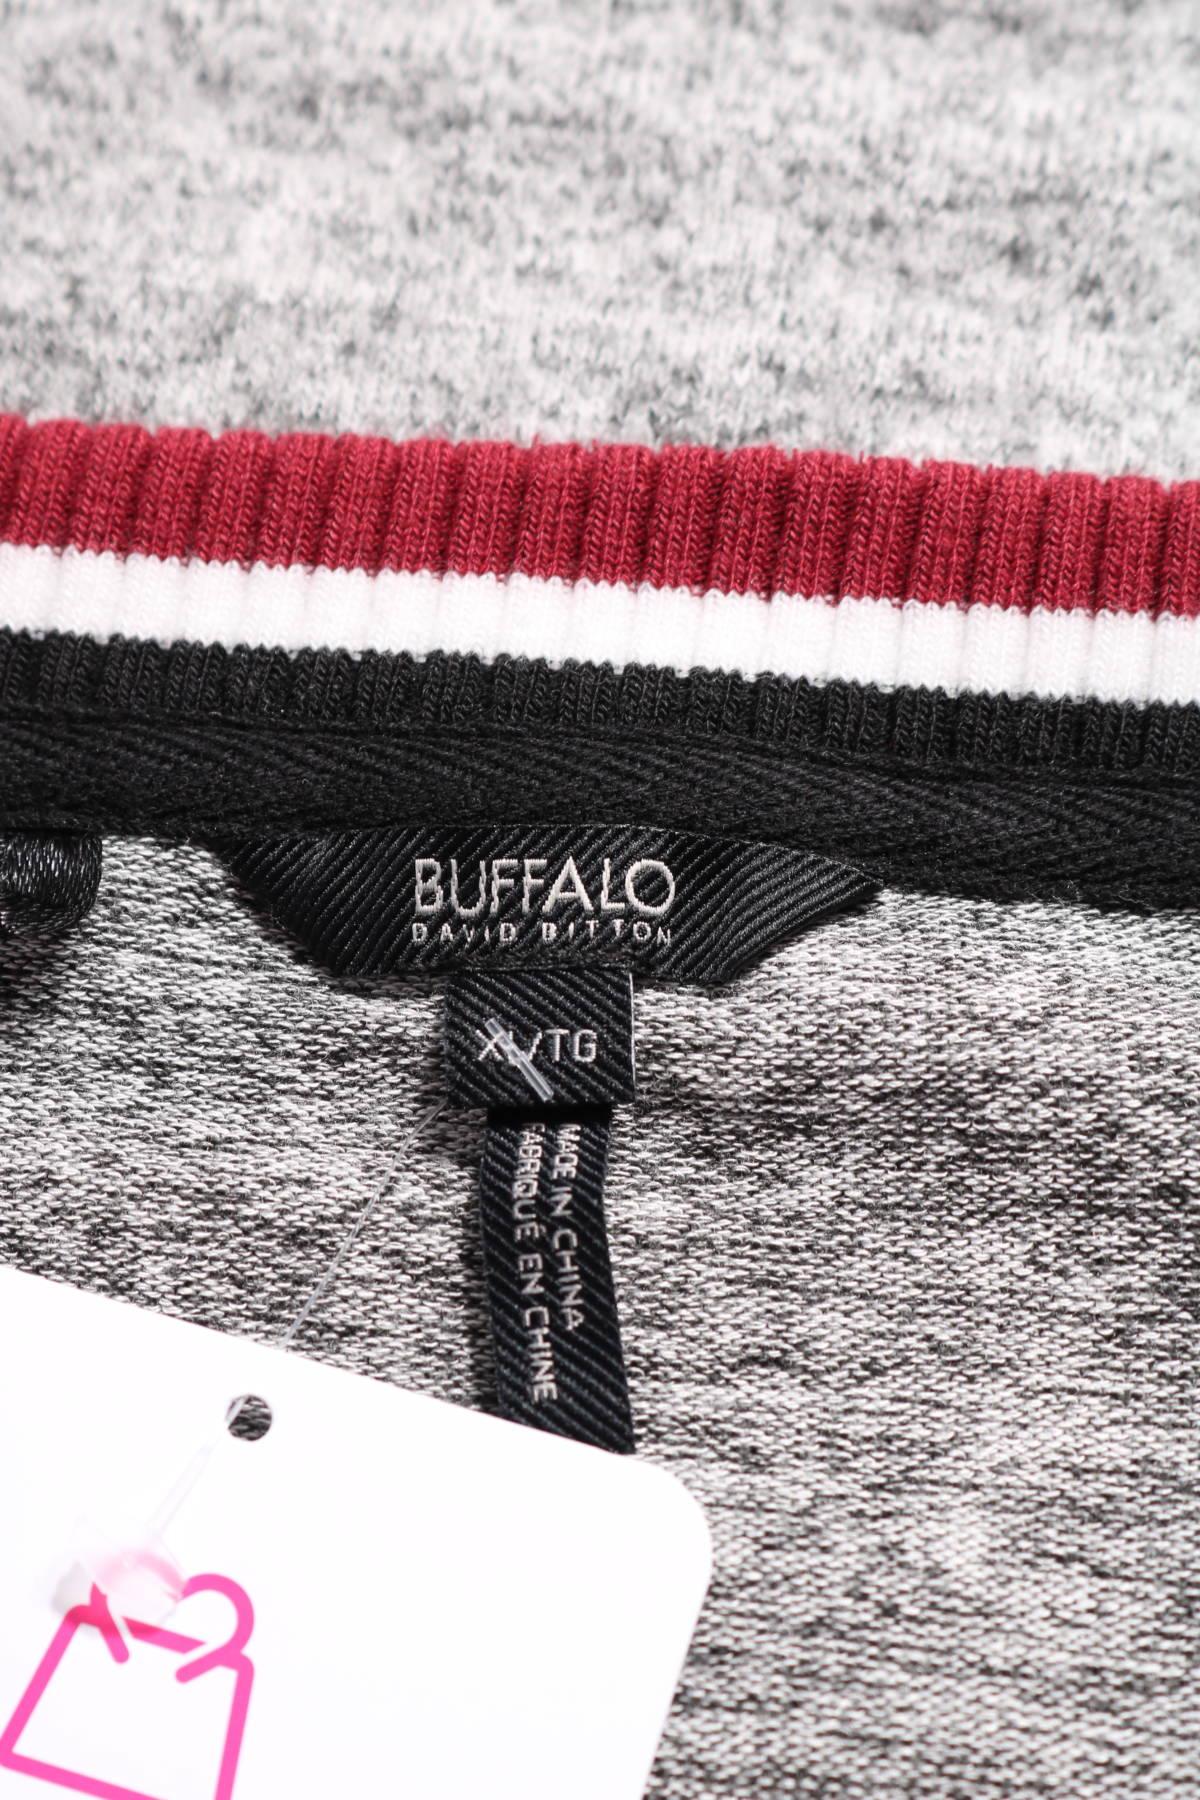 Блуза Buffalo David bitton3